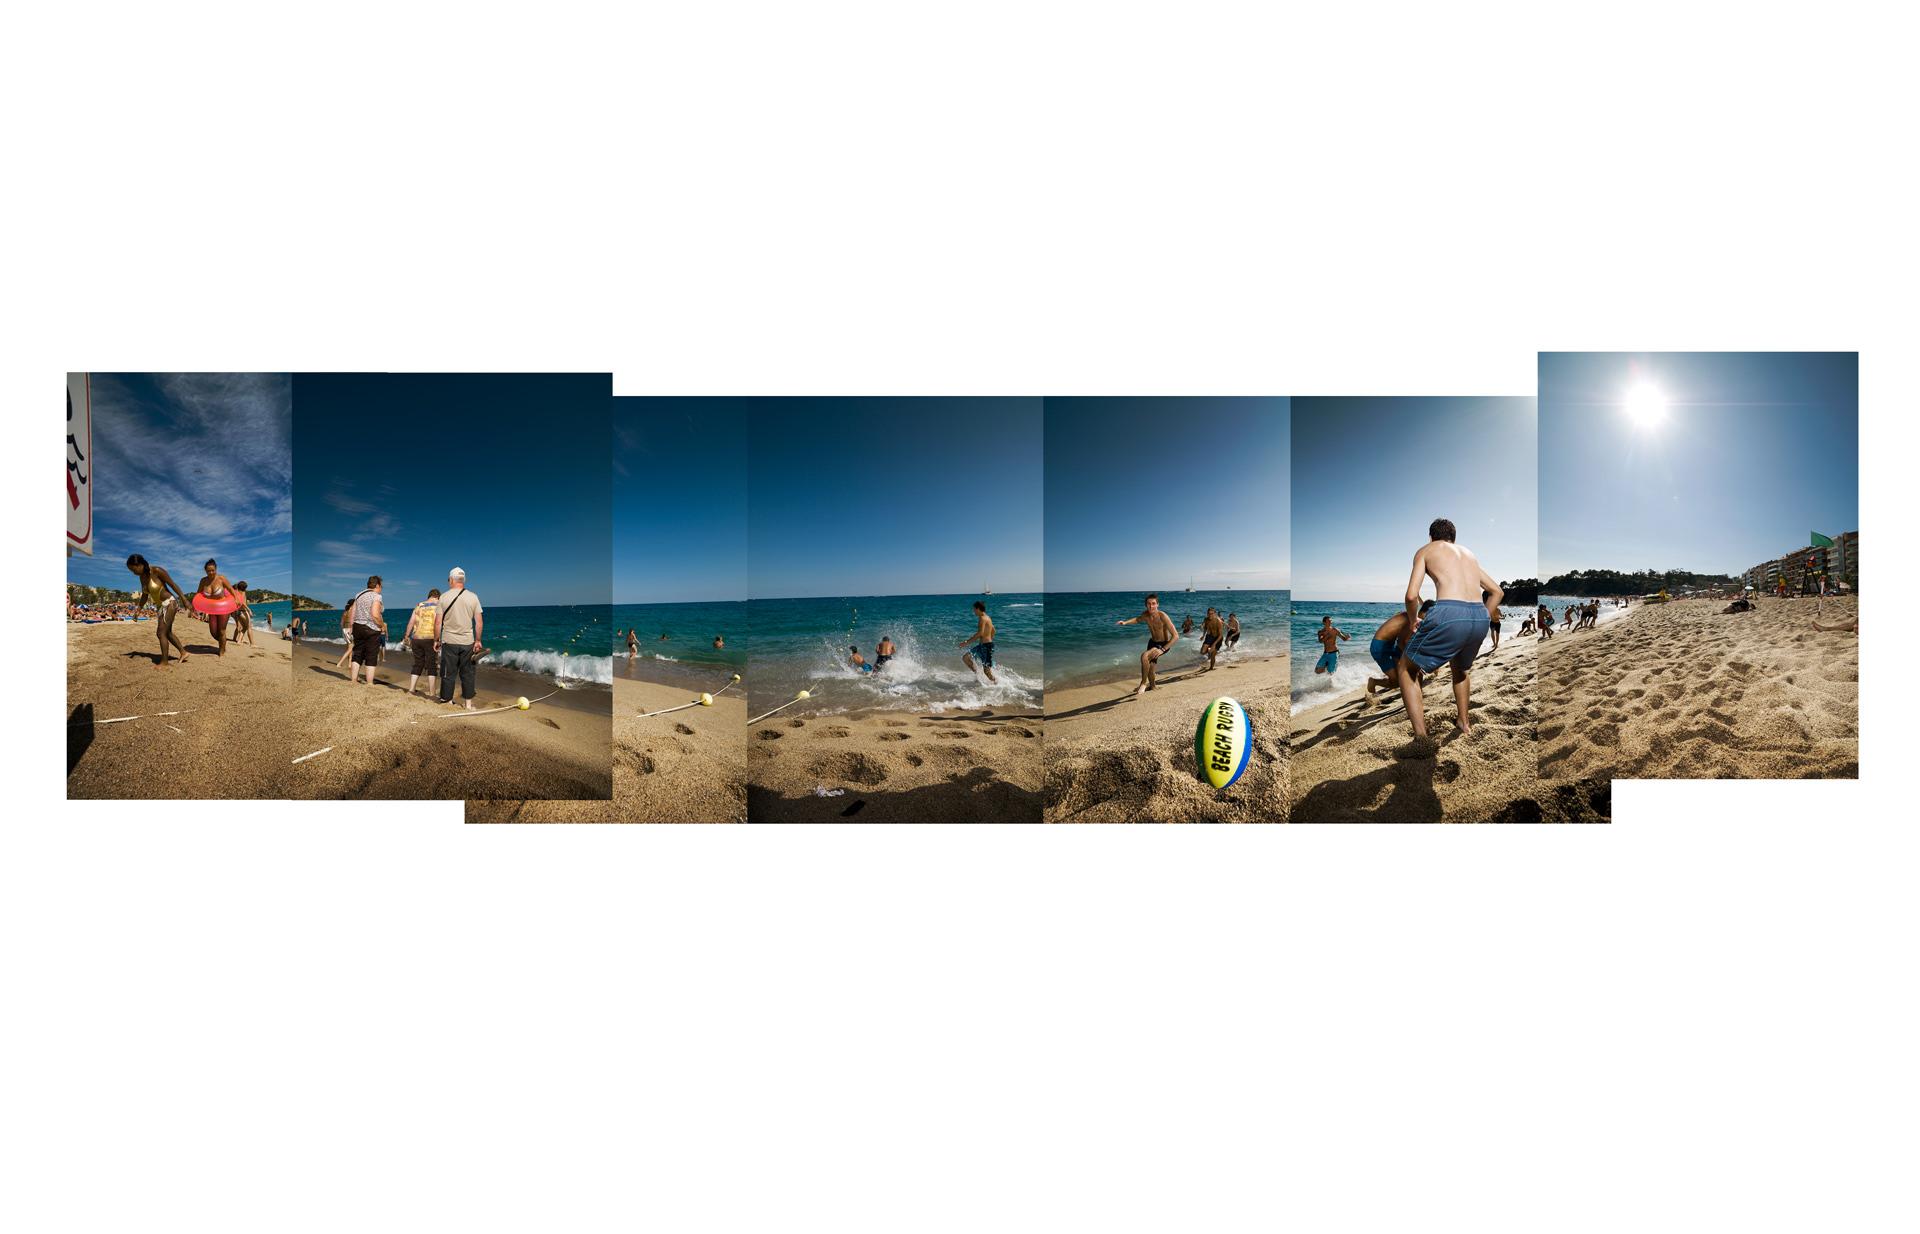 ©ankeluckmann640, ADAC, Reisemagazin, beach, spain, costa brava, people, landscape